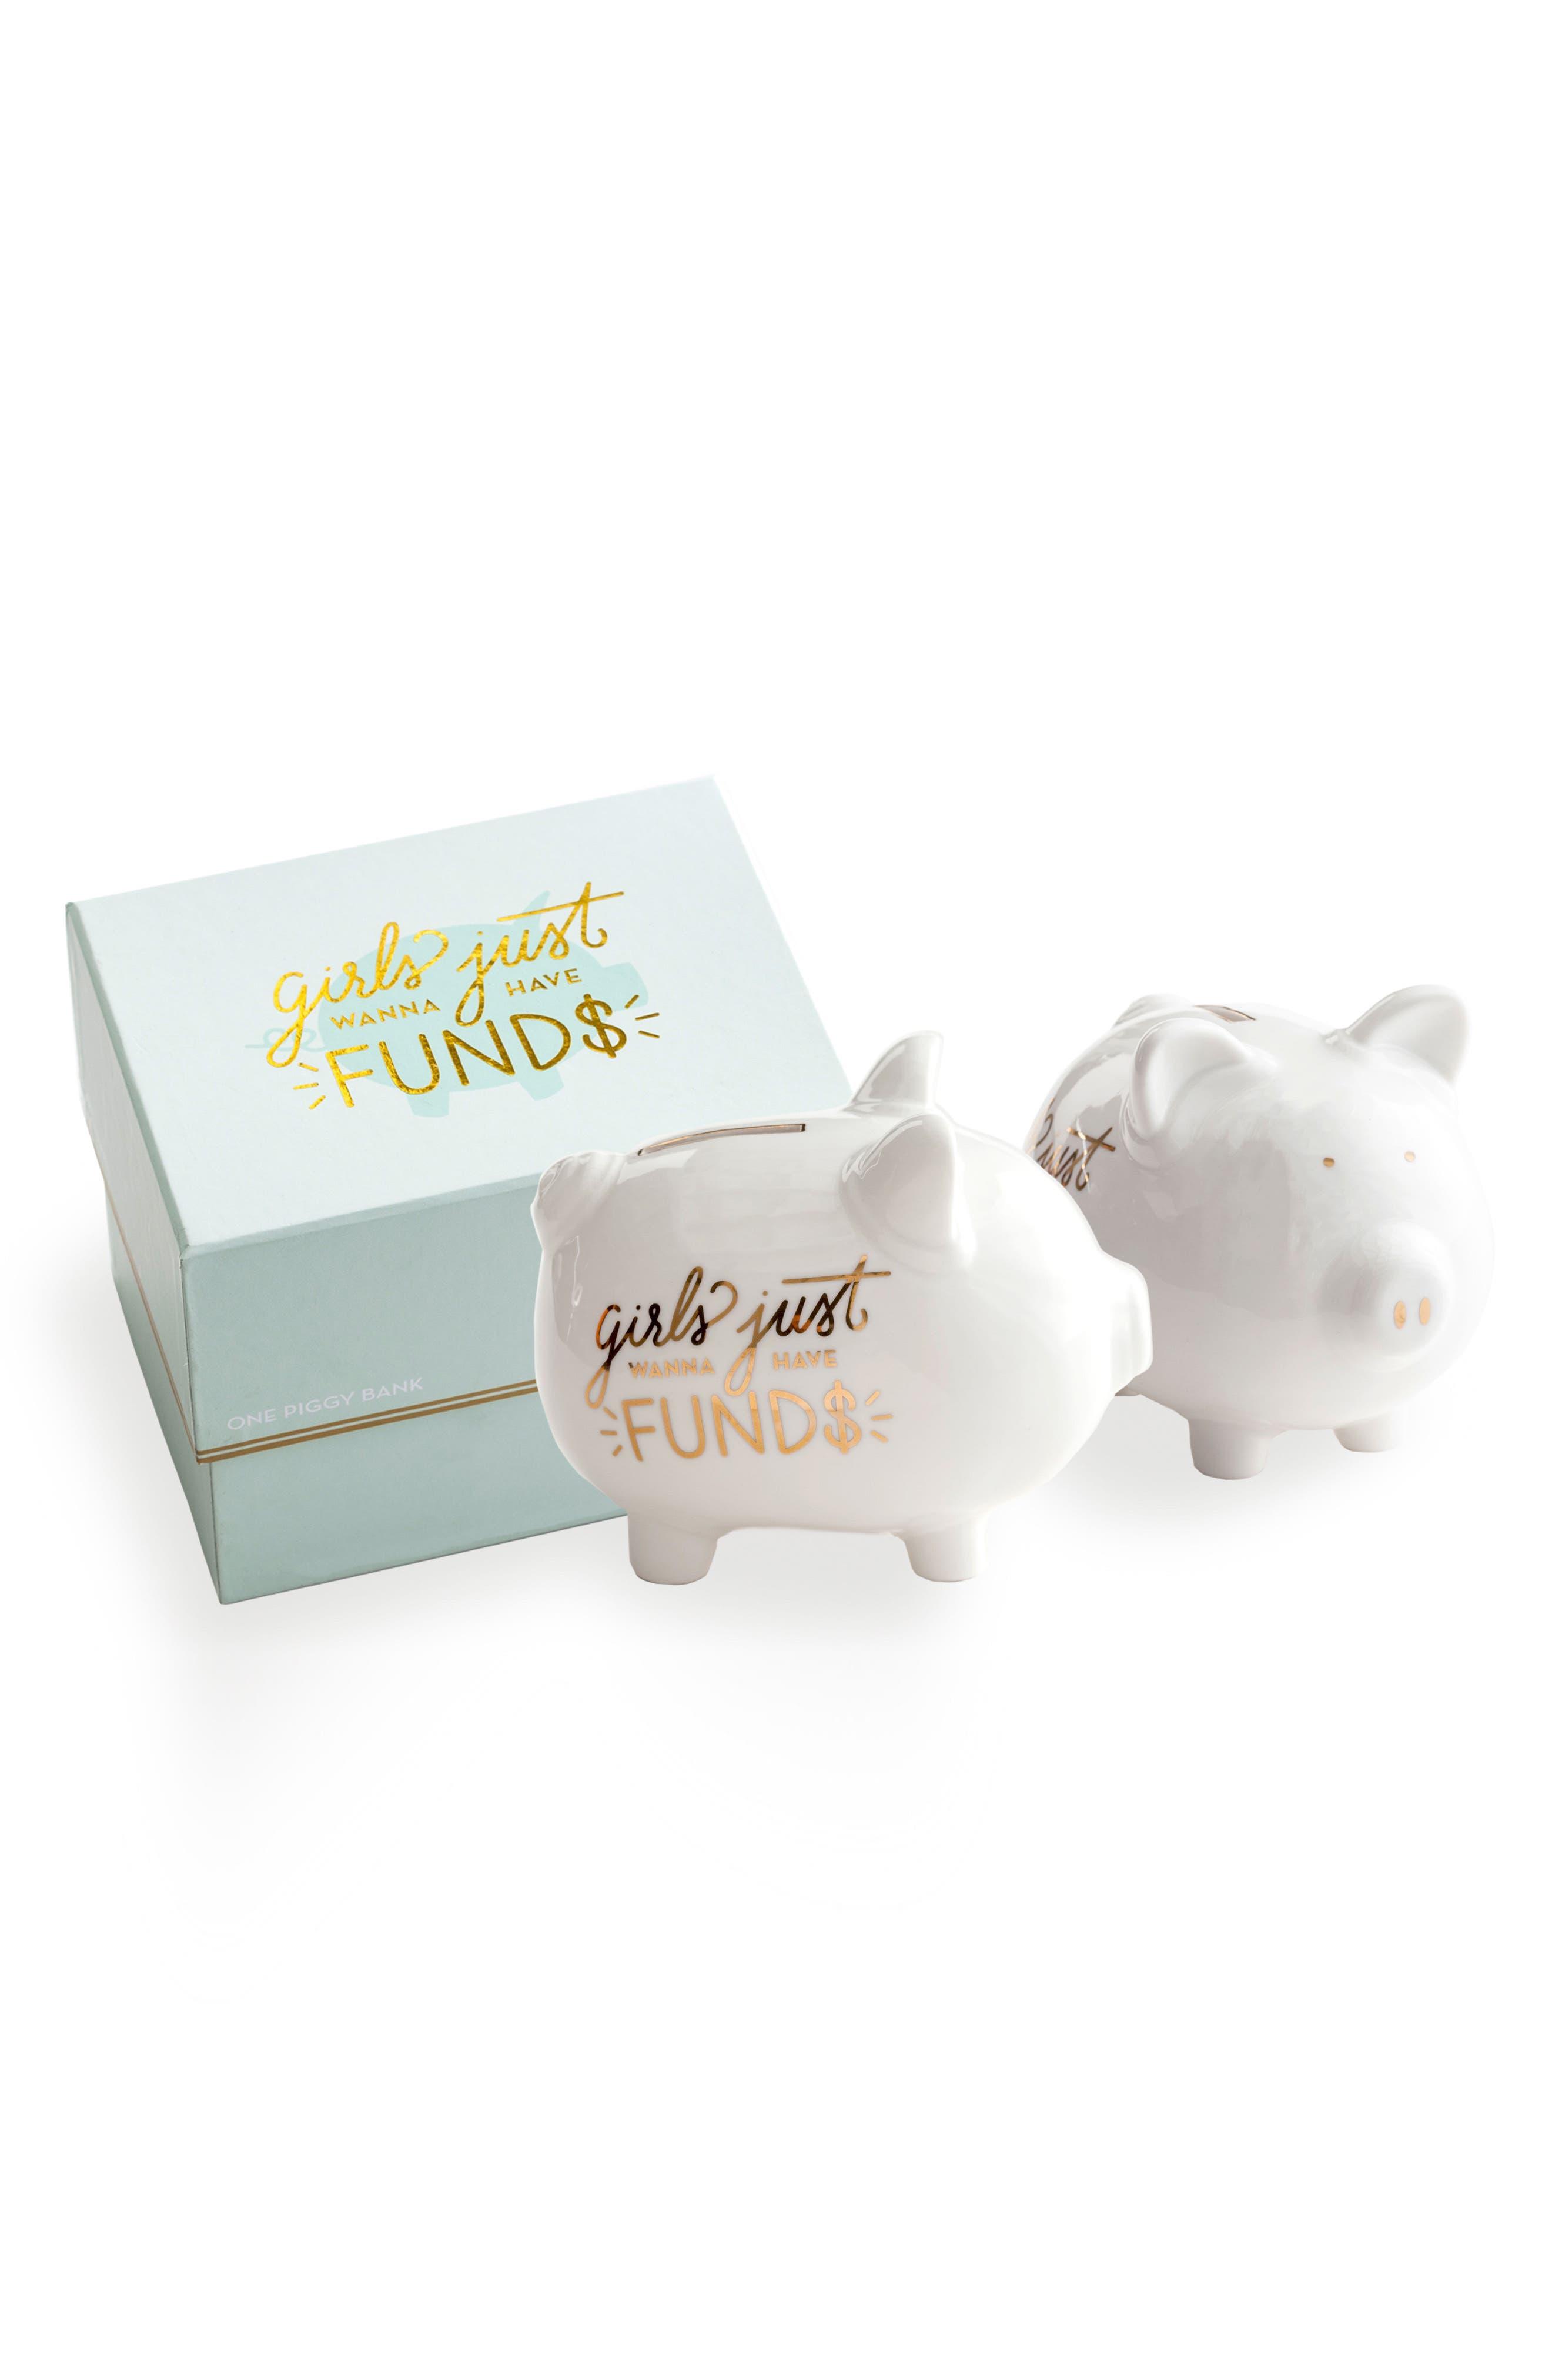 Alternate Image 1 Selected - Rosanna Girls Just Wanna Have Funds Porcelain Piggy Bank